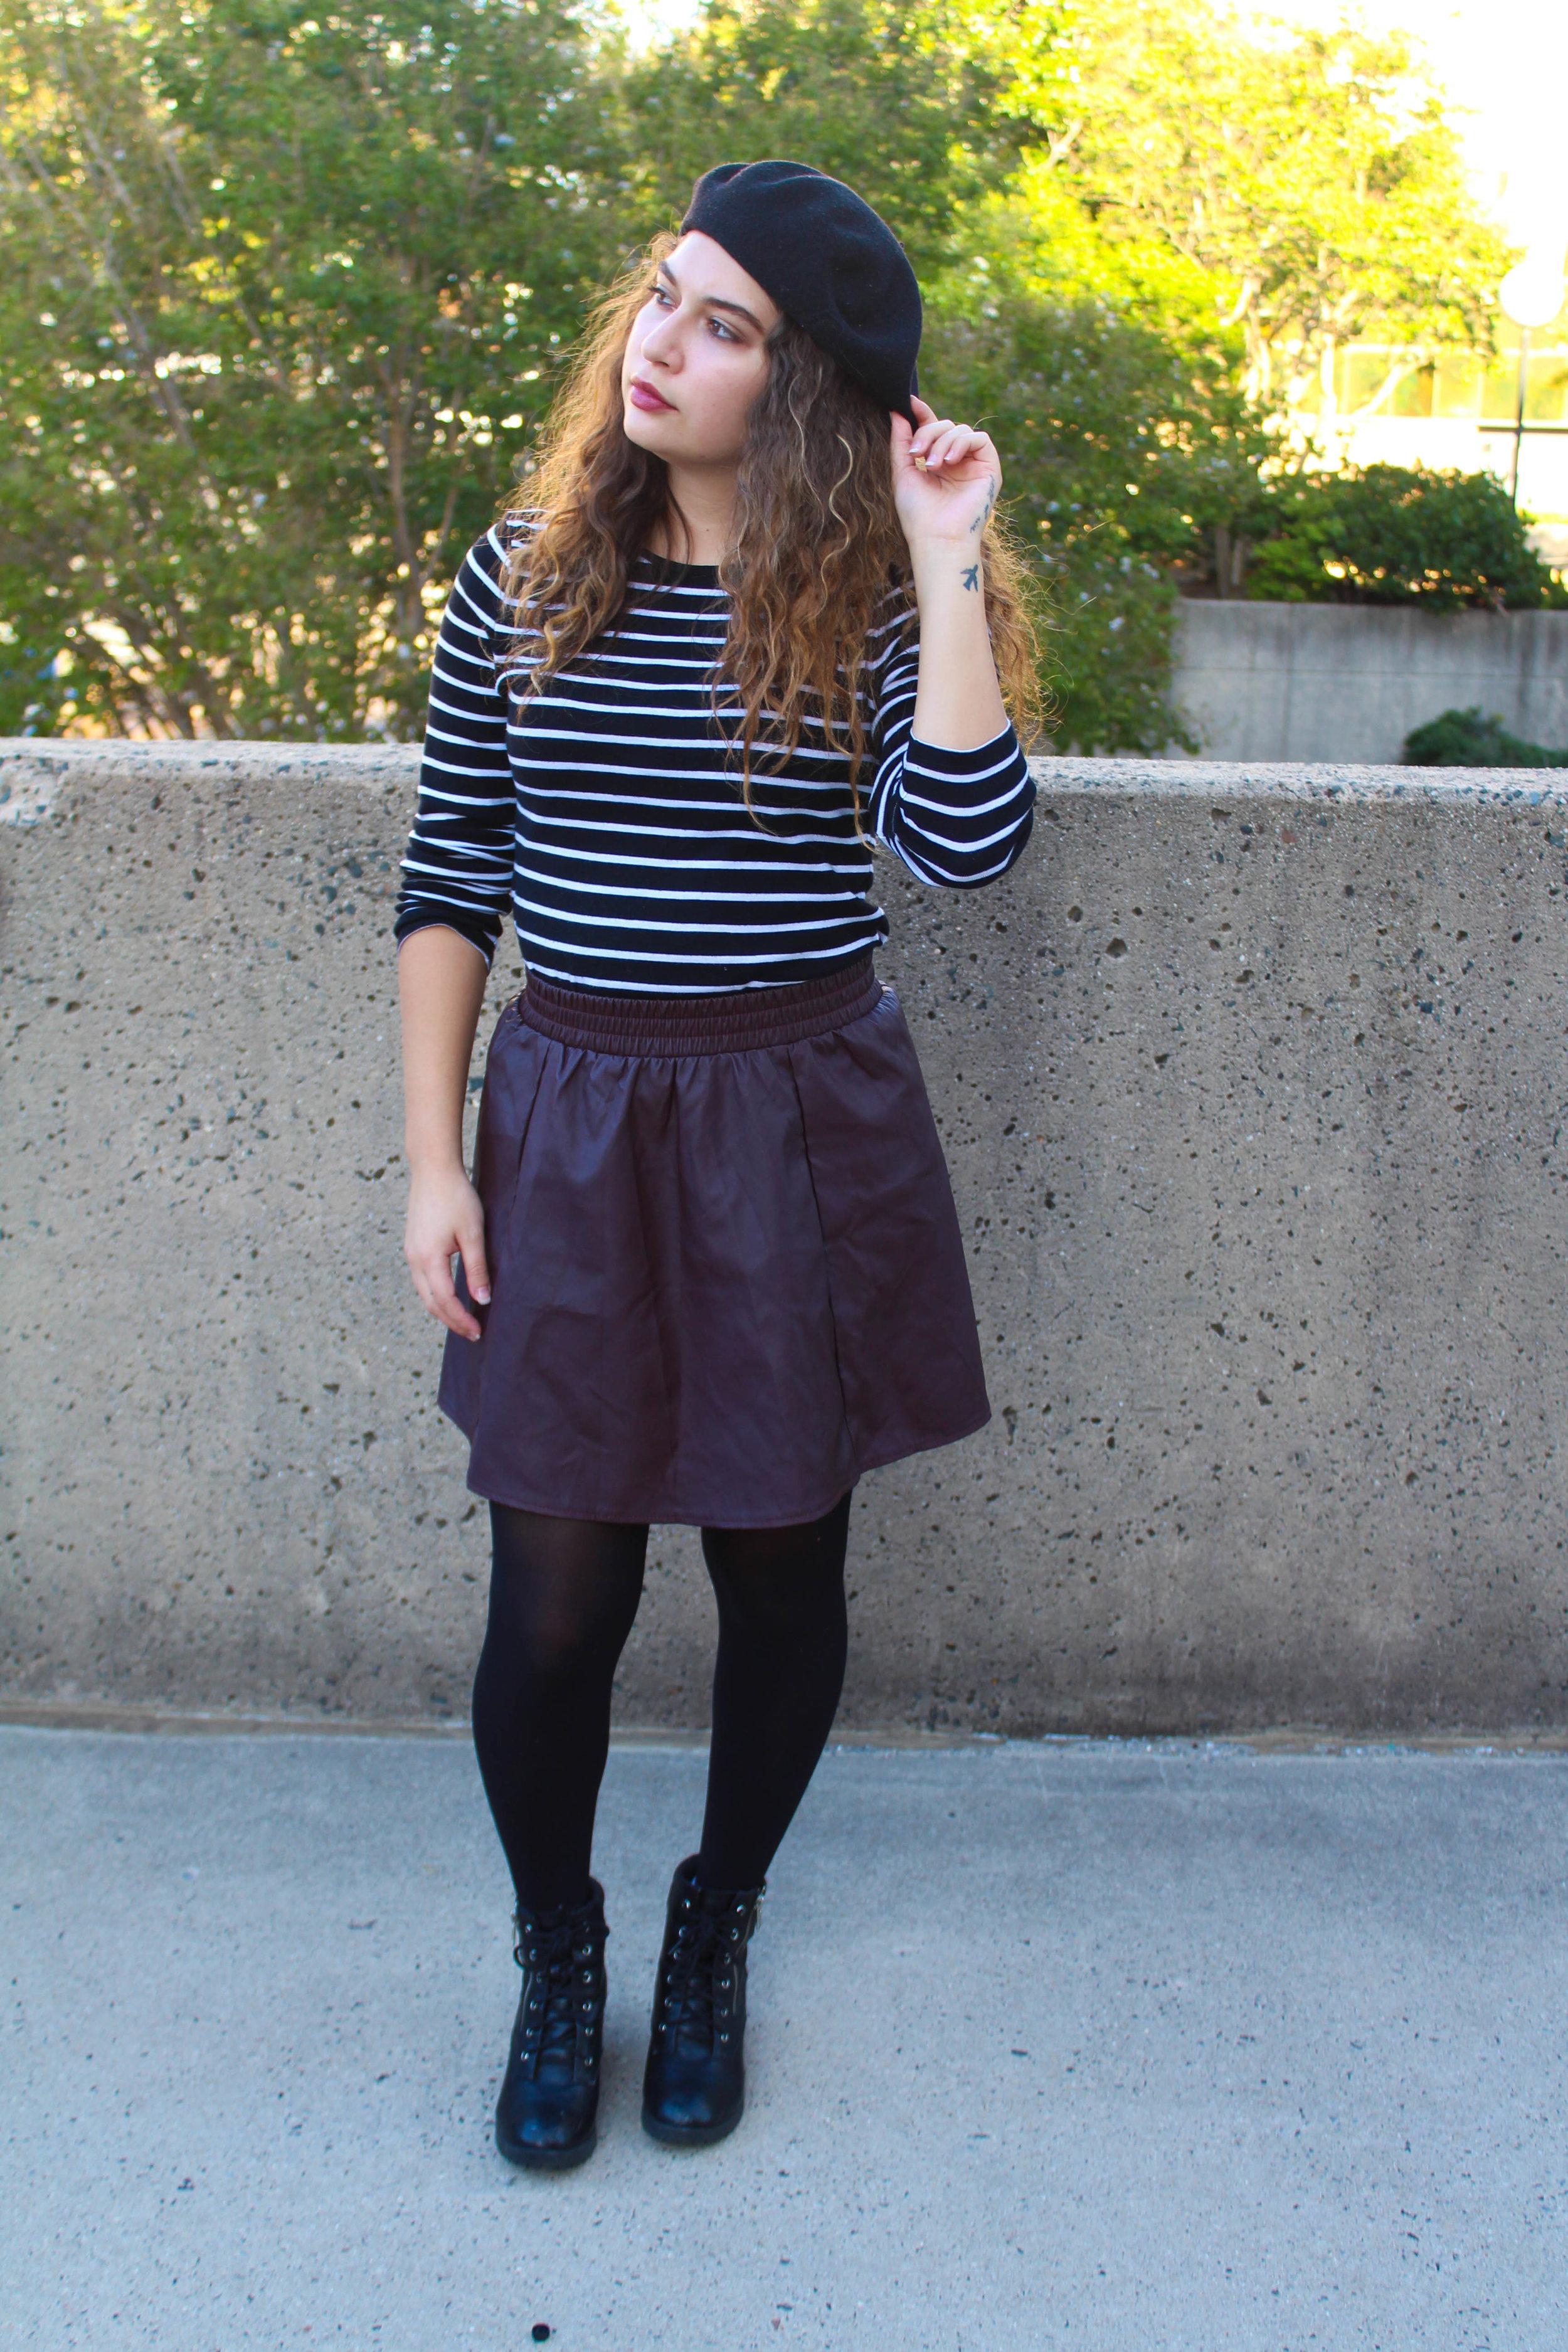 French Girl-3-1384.jpg